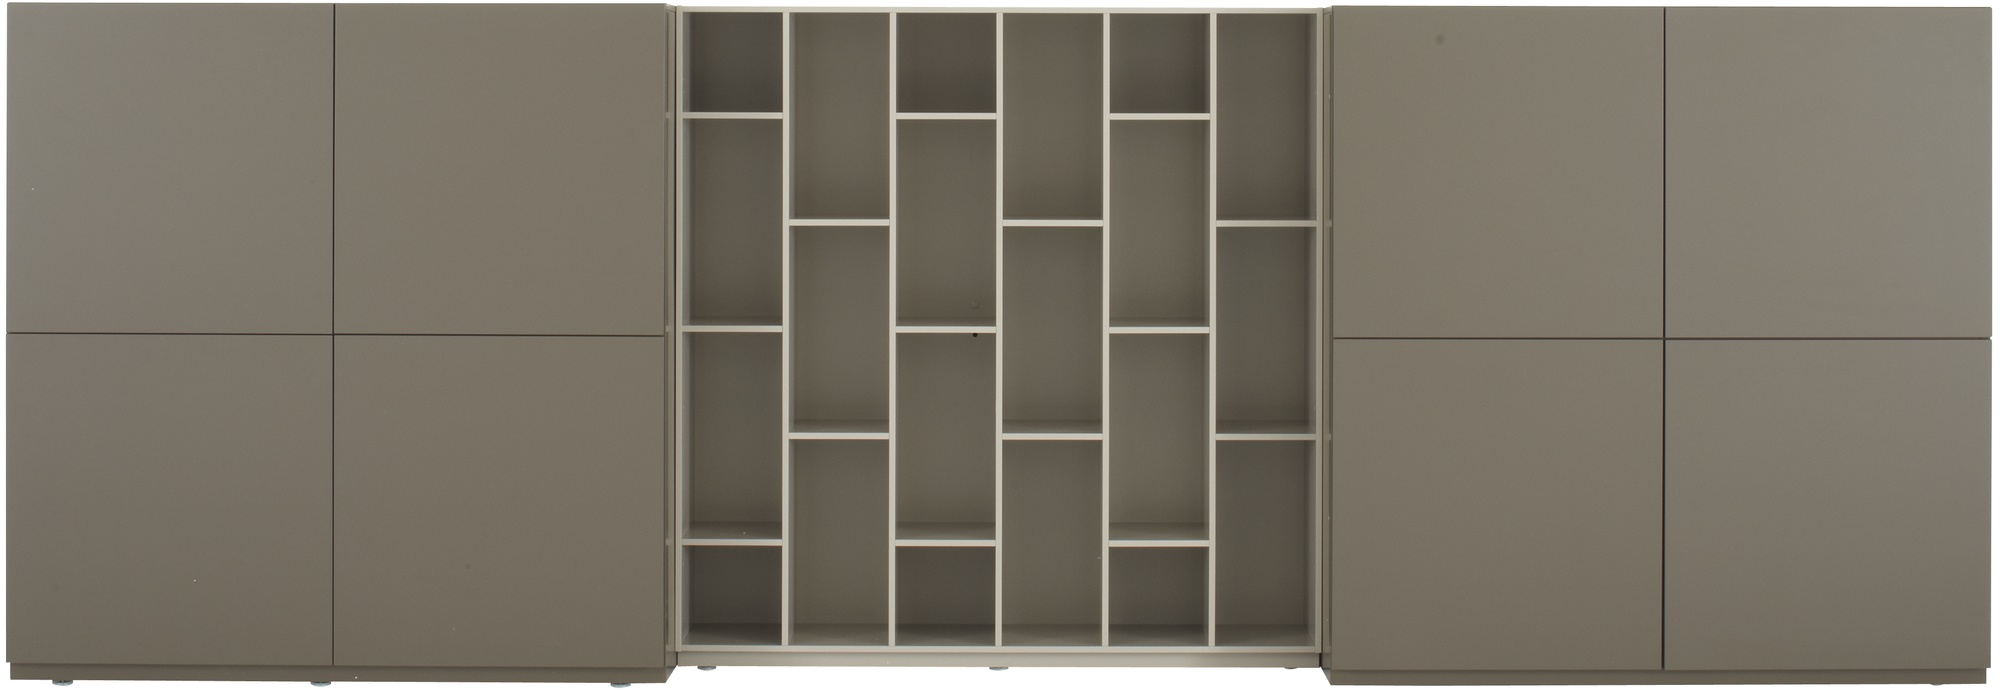 book look meubles muraux designer pagnon pelha tre ligne roset. Black Bedroom Furniture Sets. Home Design Ideas